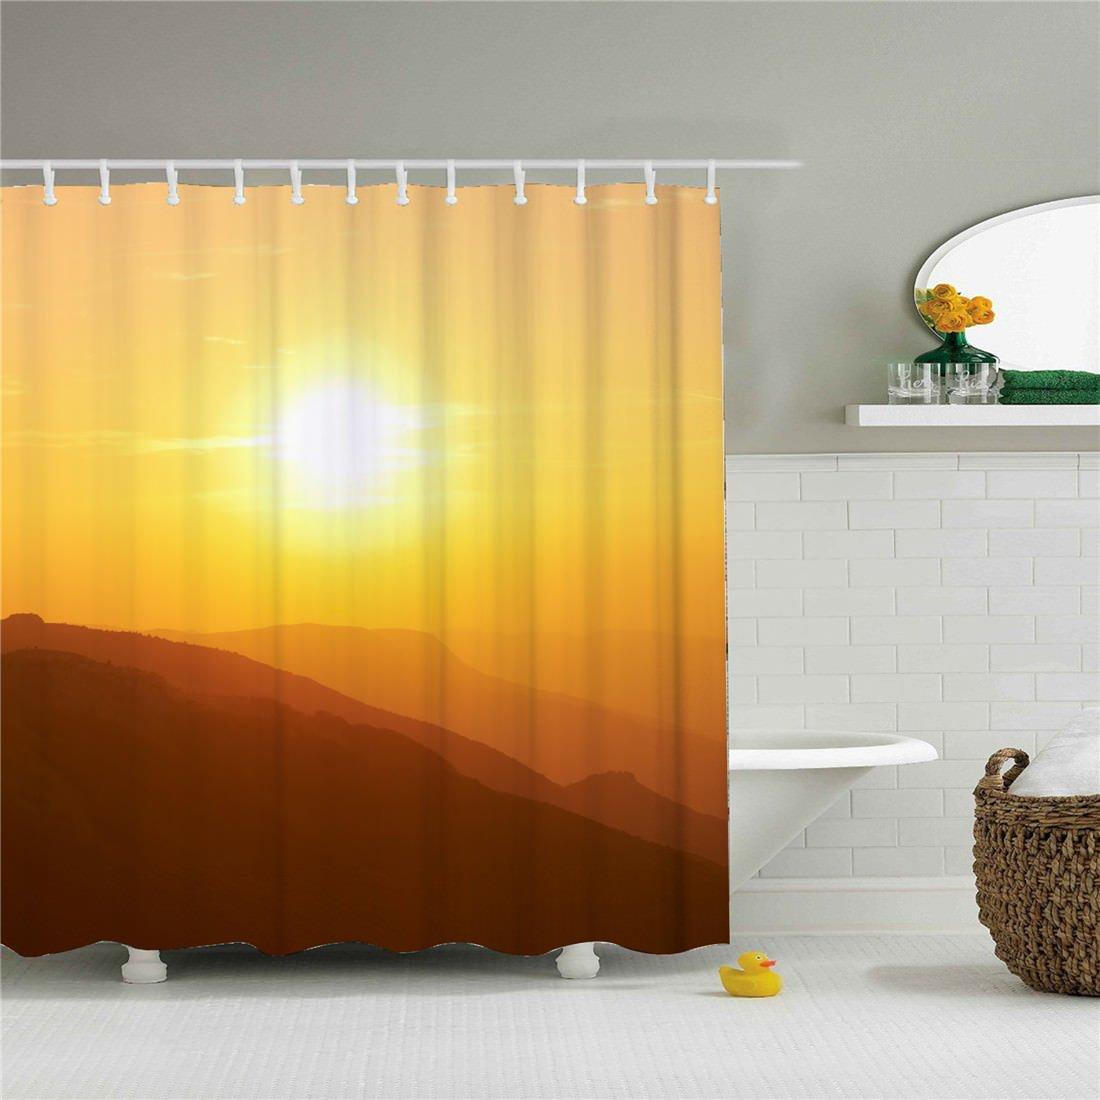 starlight-Bracele Bathroom shower curtain, sunrise peaks, beautiful scenery, orange,polyester% waterproof, mildew, odorless Ladies and men special-purpose.Holiday gifts.